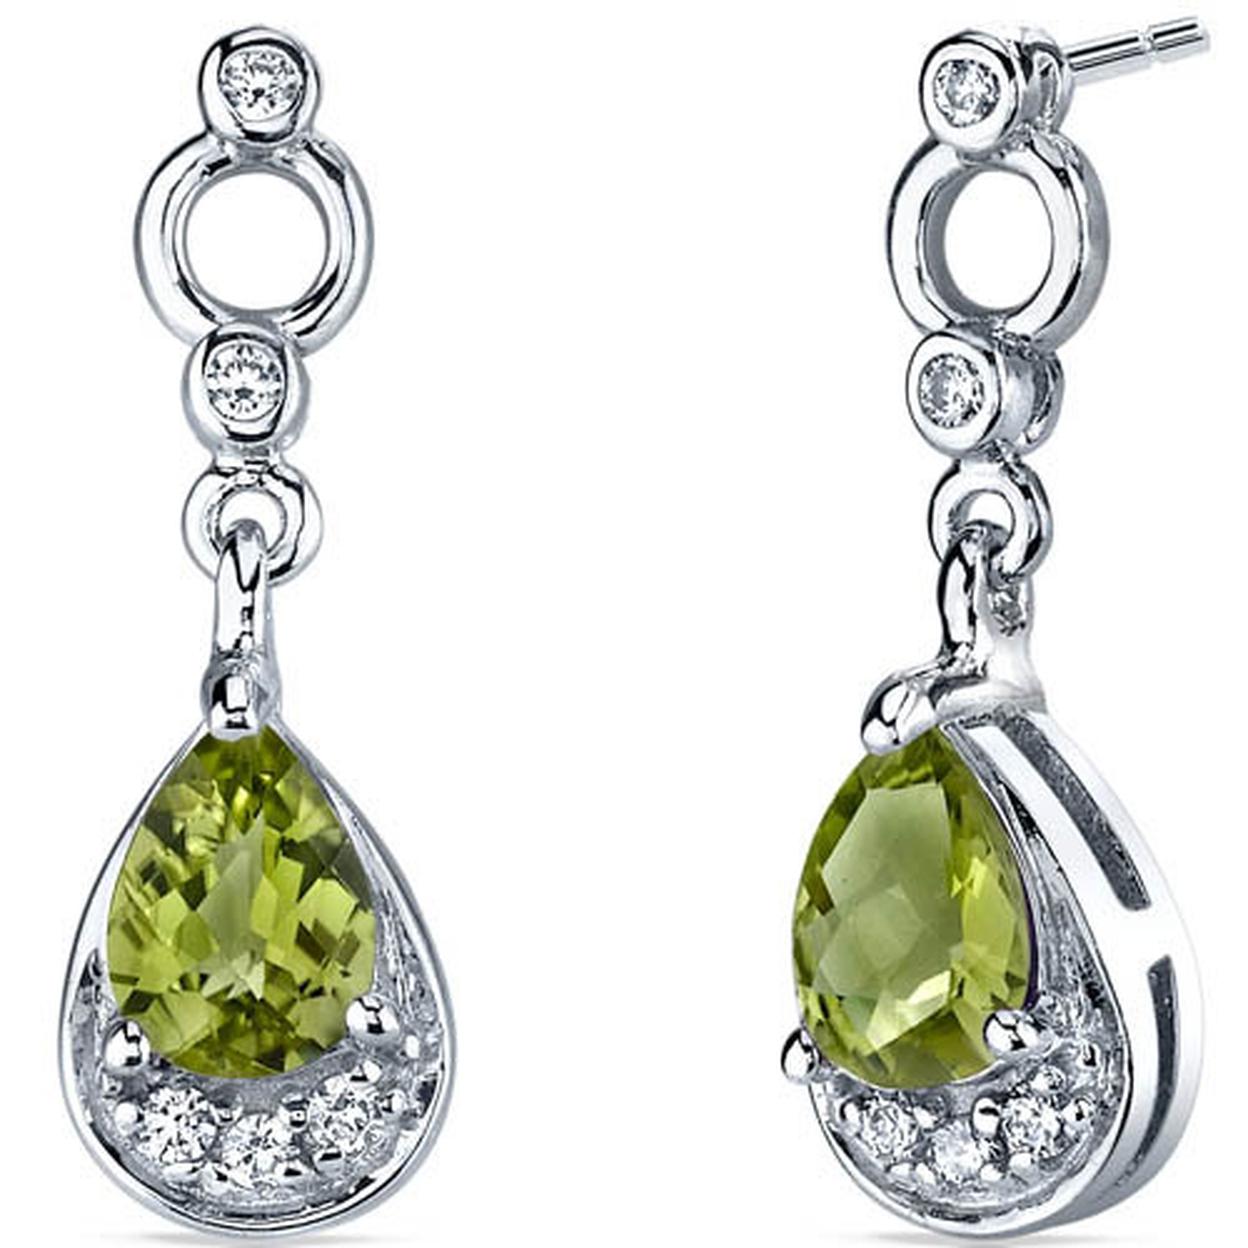 Simply Classy 1.50 Carats Peridot Dangle Earrings In Sterling Silver Style Se7142